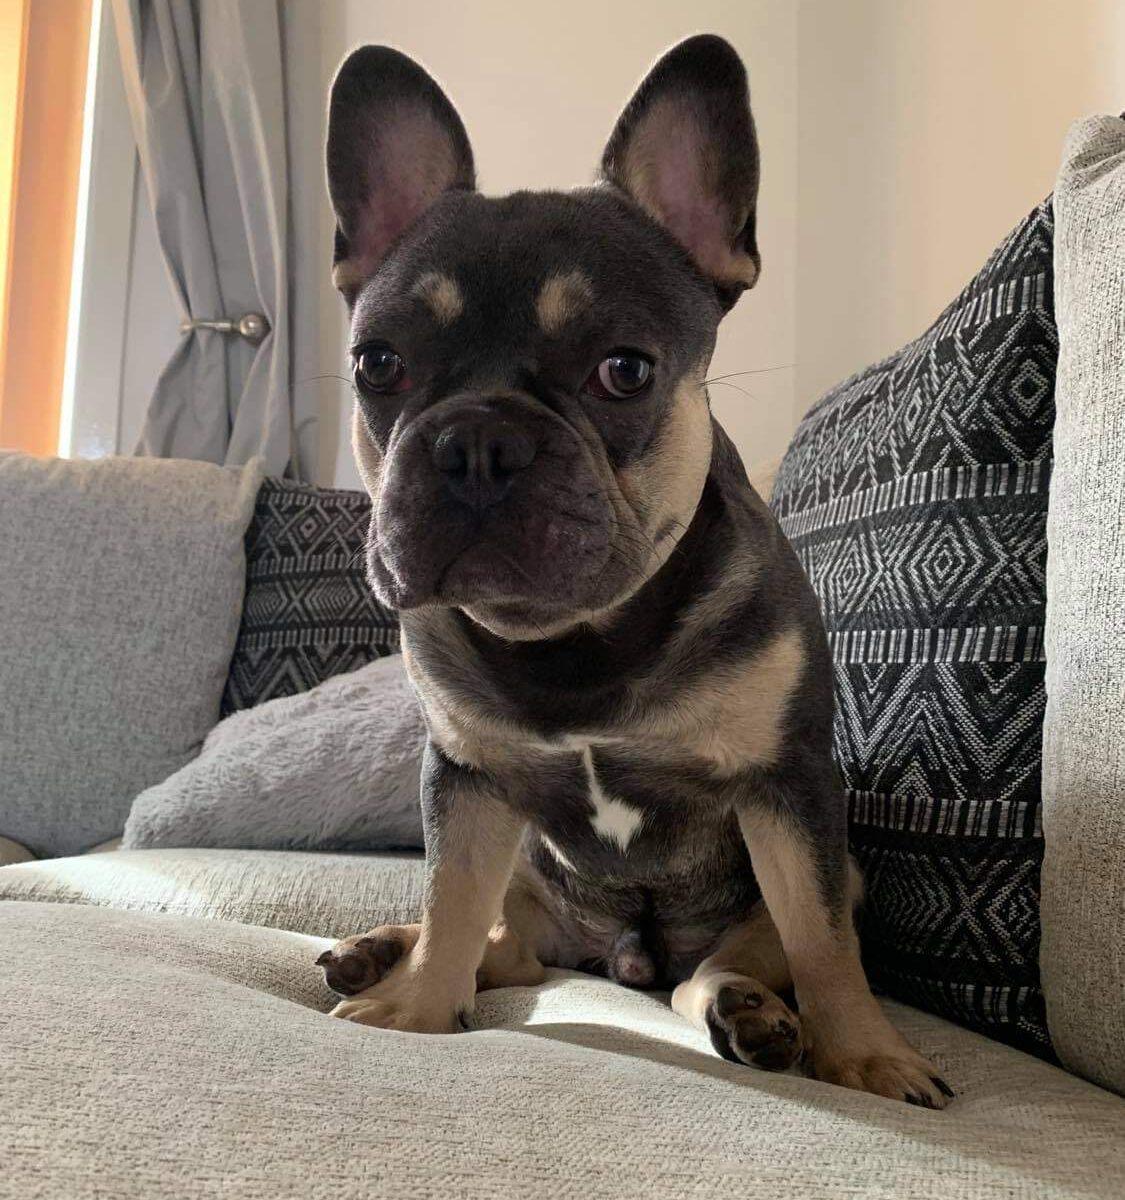 Rocko the French Bulldog